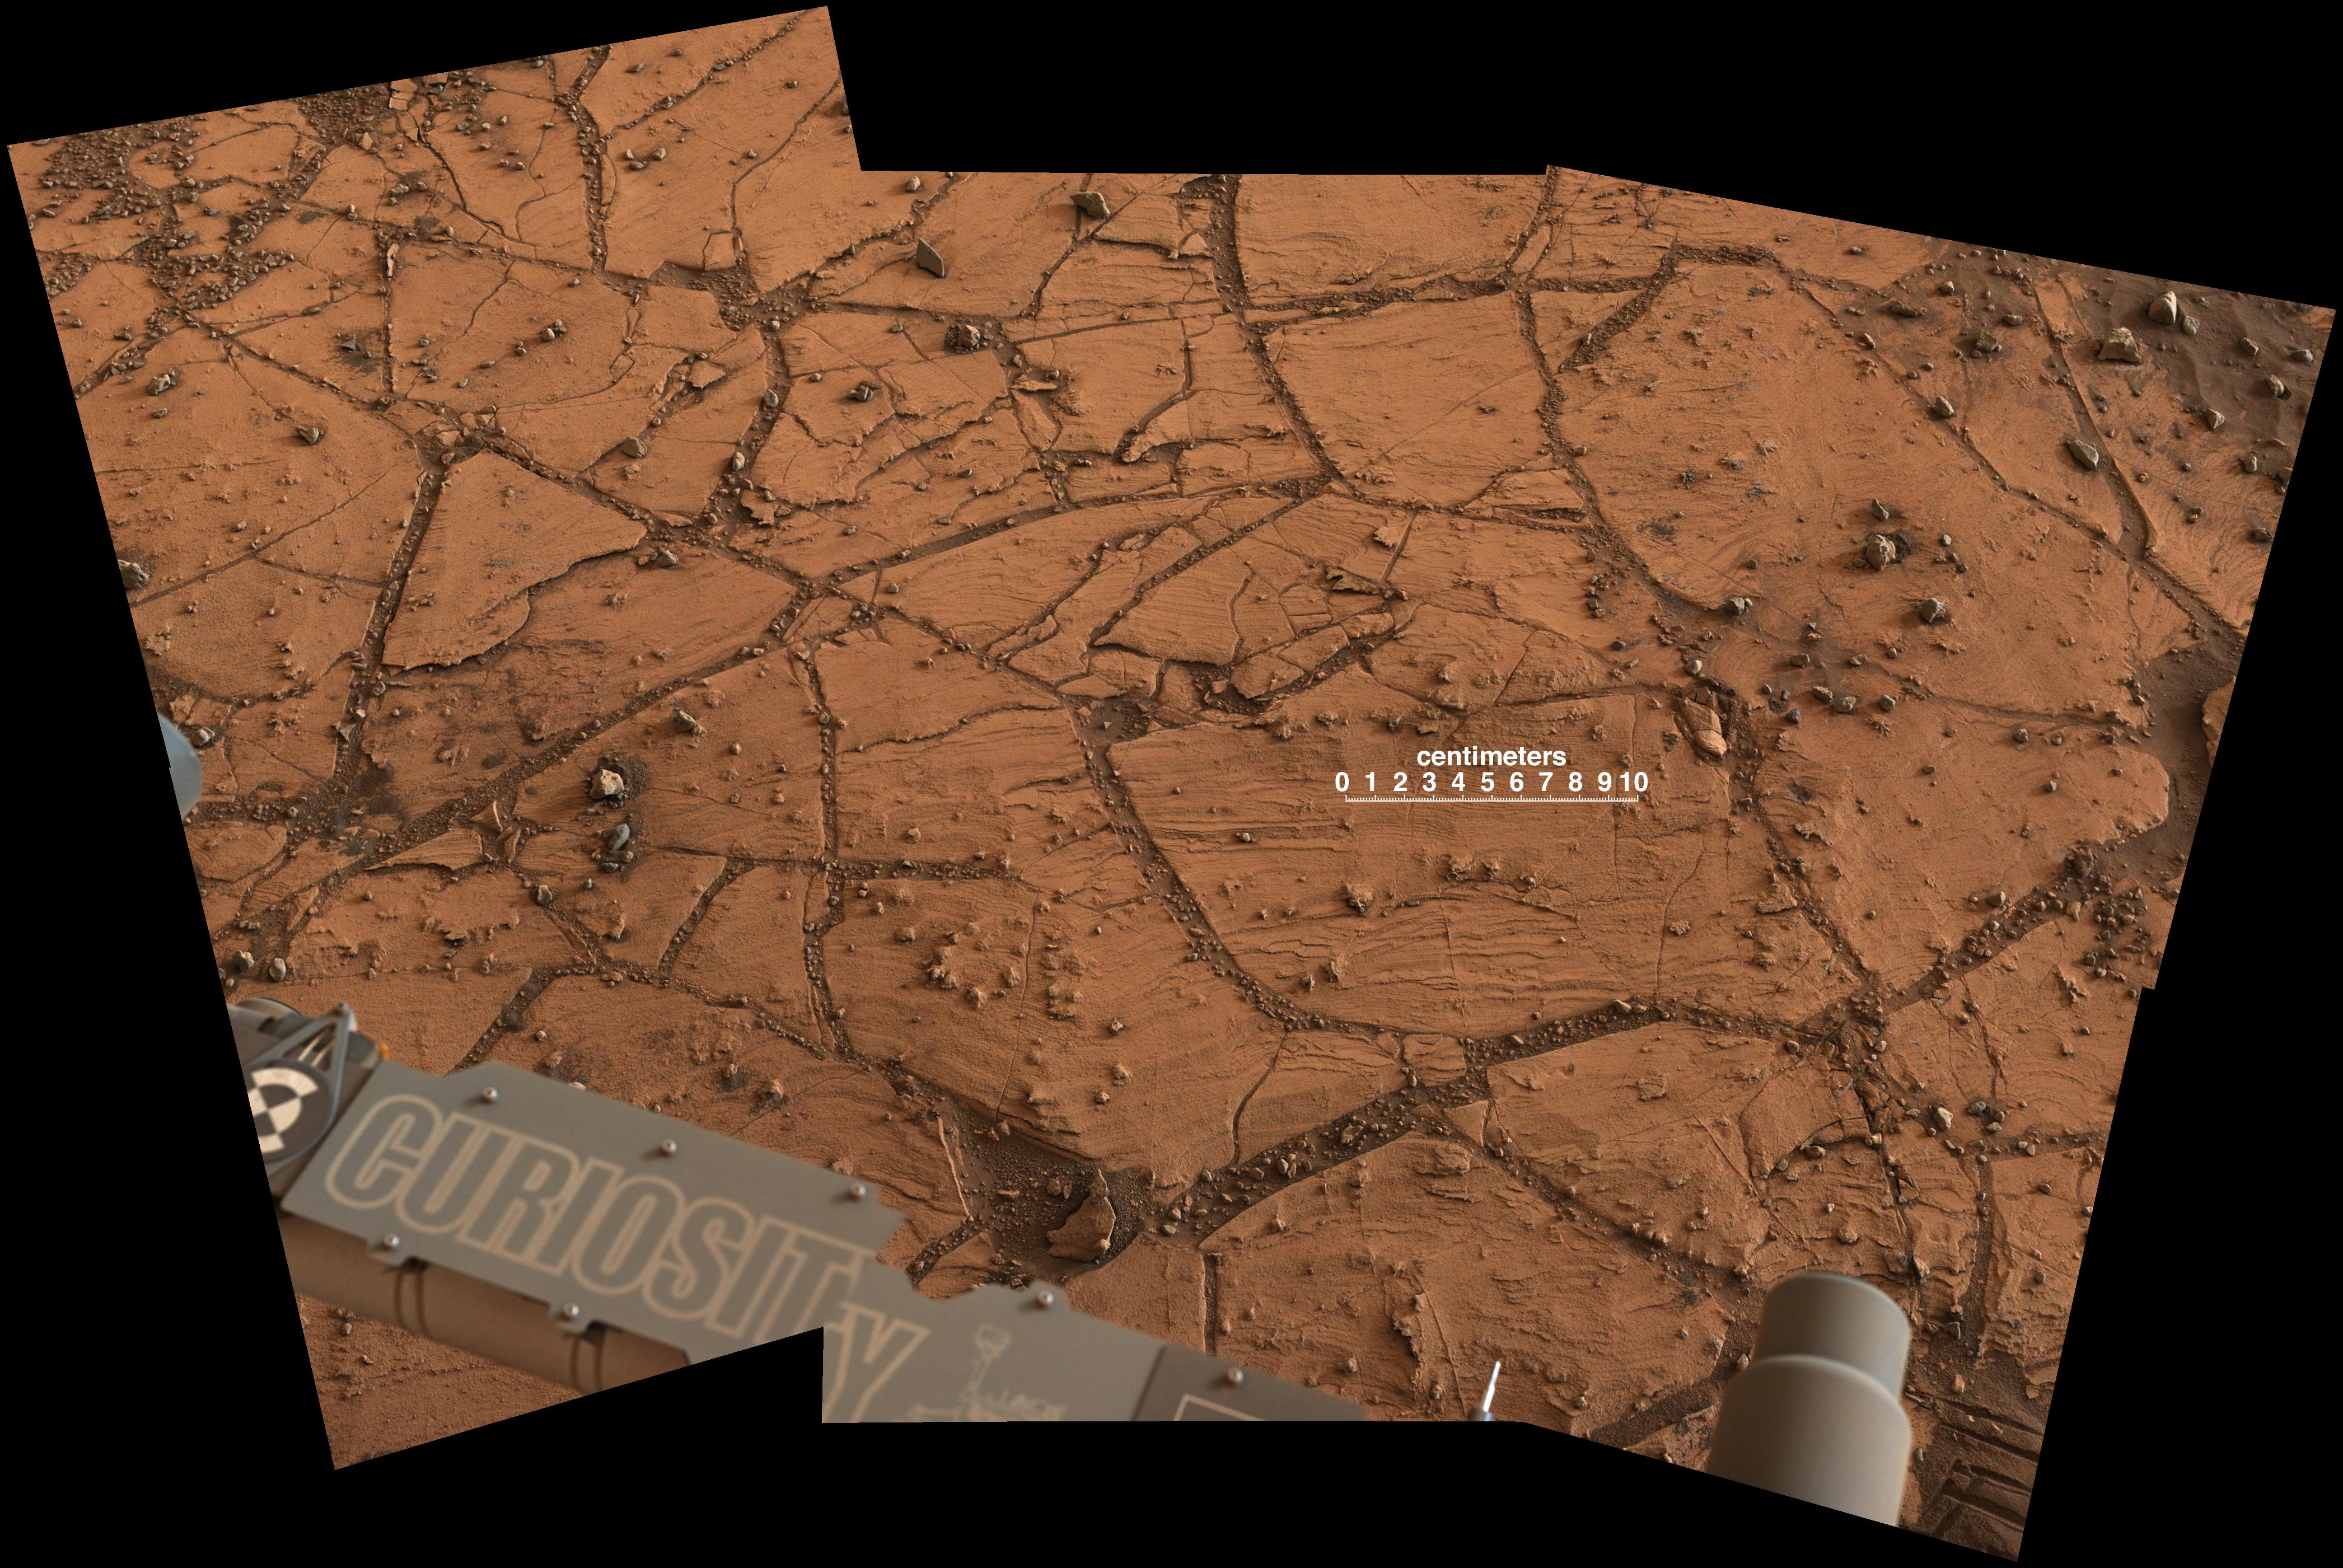 Mars-Curiosity-Rover-Martian-Bedrock-Mt-Sharp-labeled-pia18881-full